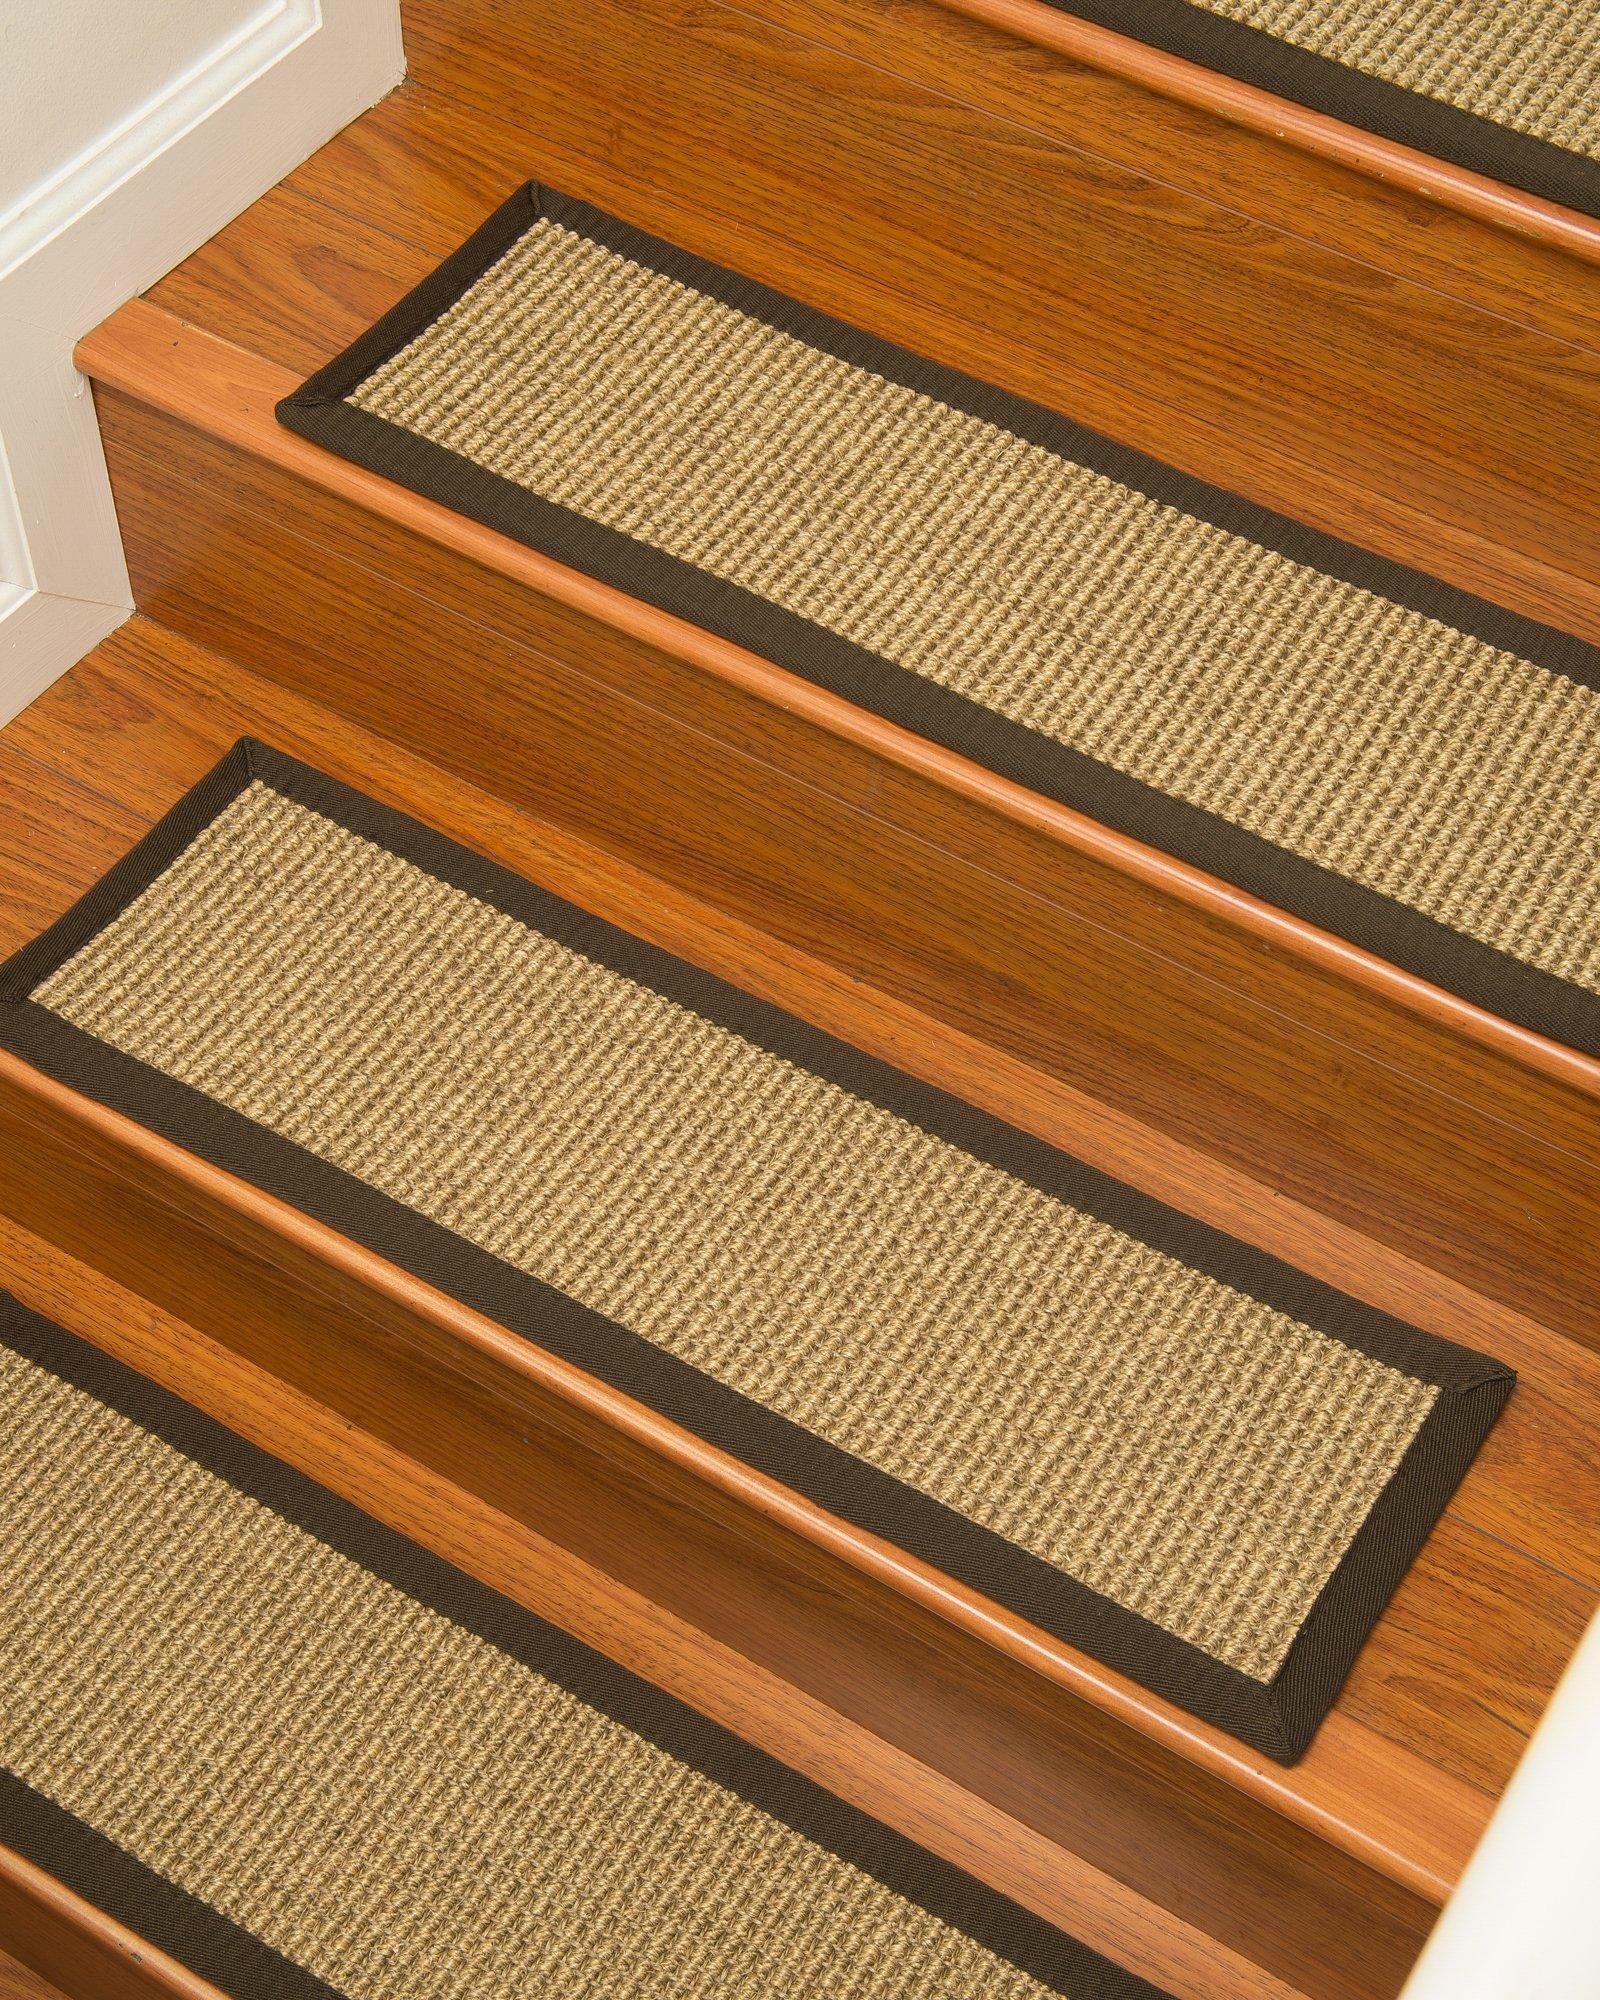 Natural Area Rugs 100% Natural Fiber Tara, Sisal Deep Gold, Handmade Stair Treads Carpet Set of 13 (9''x29'') Fudge Border